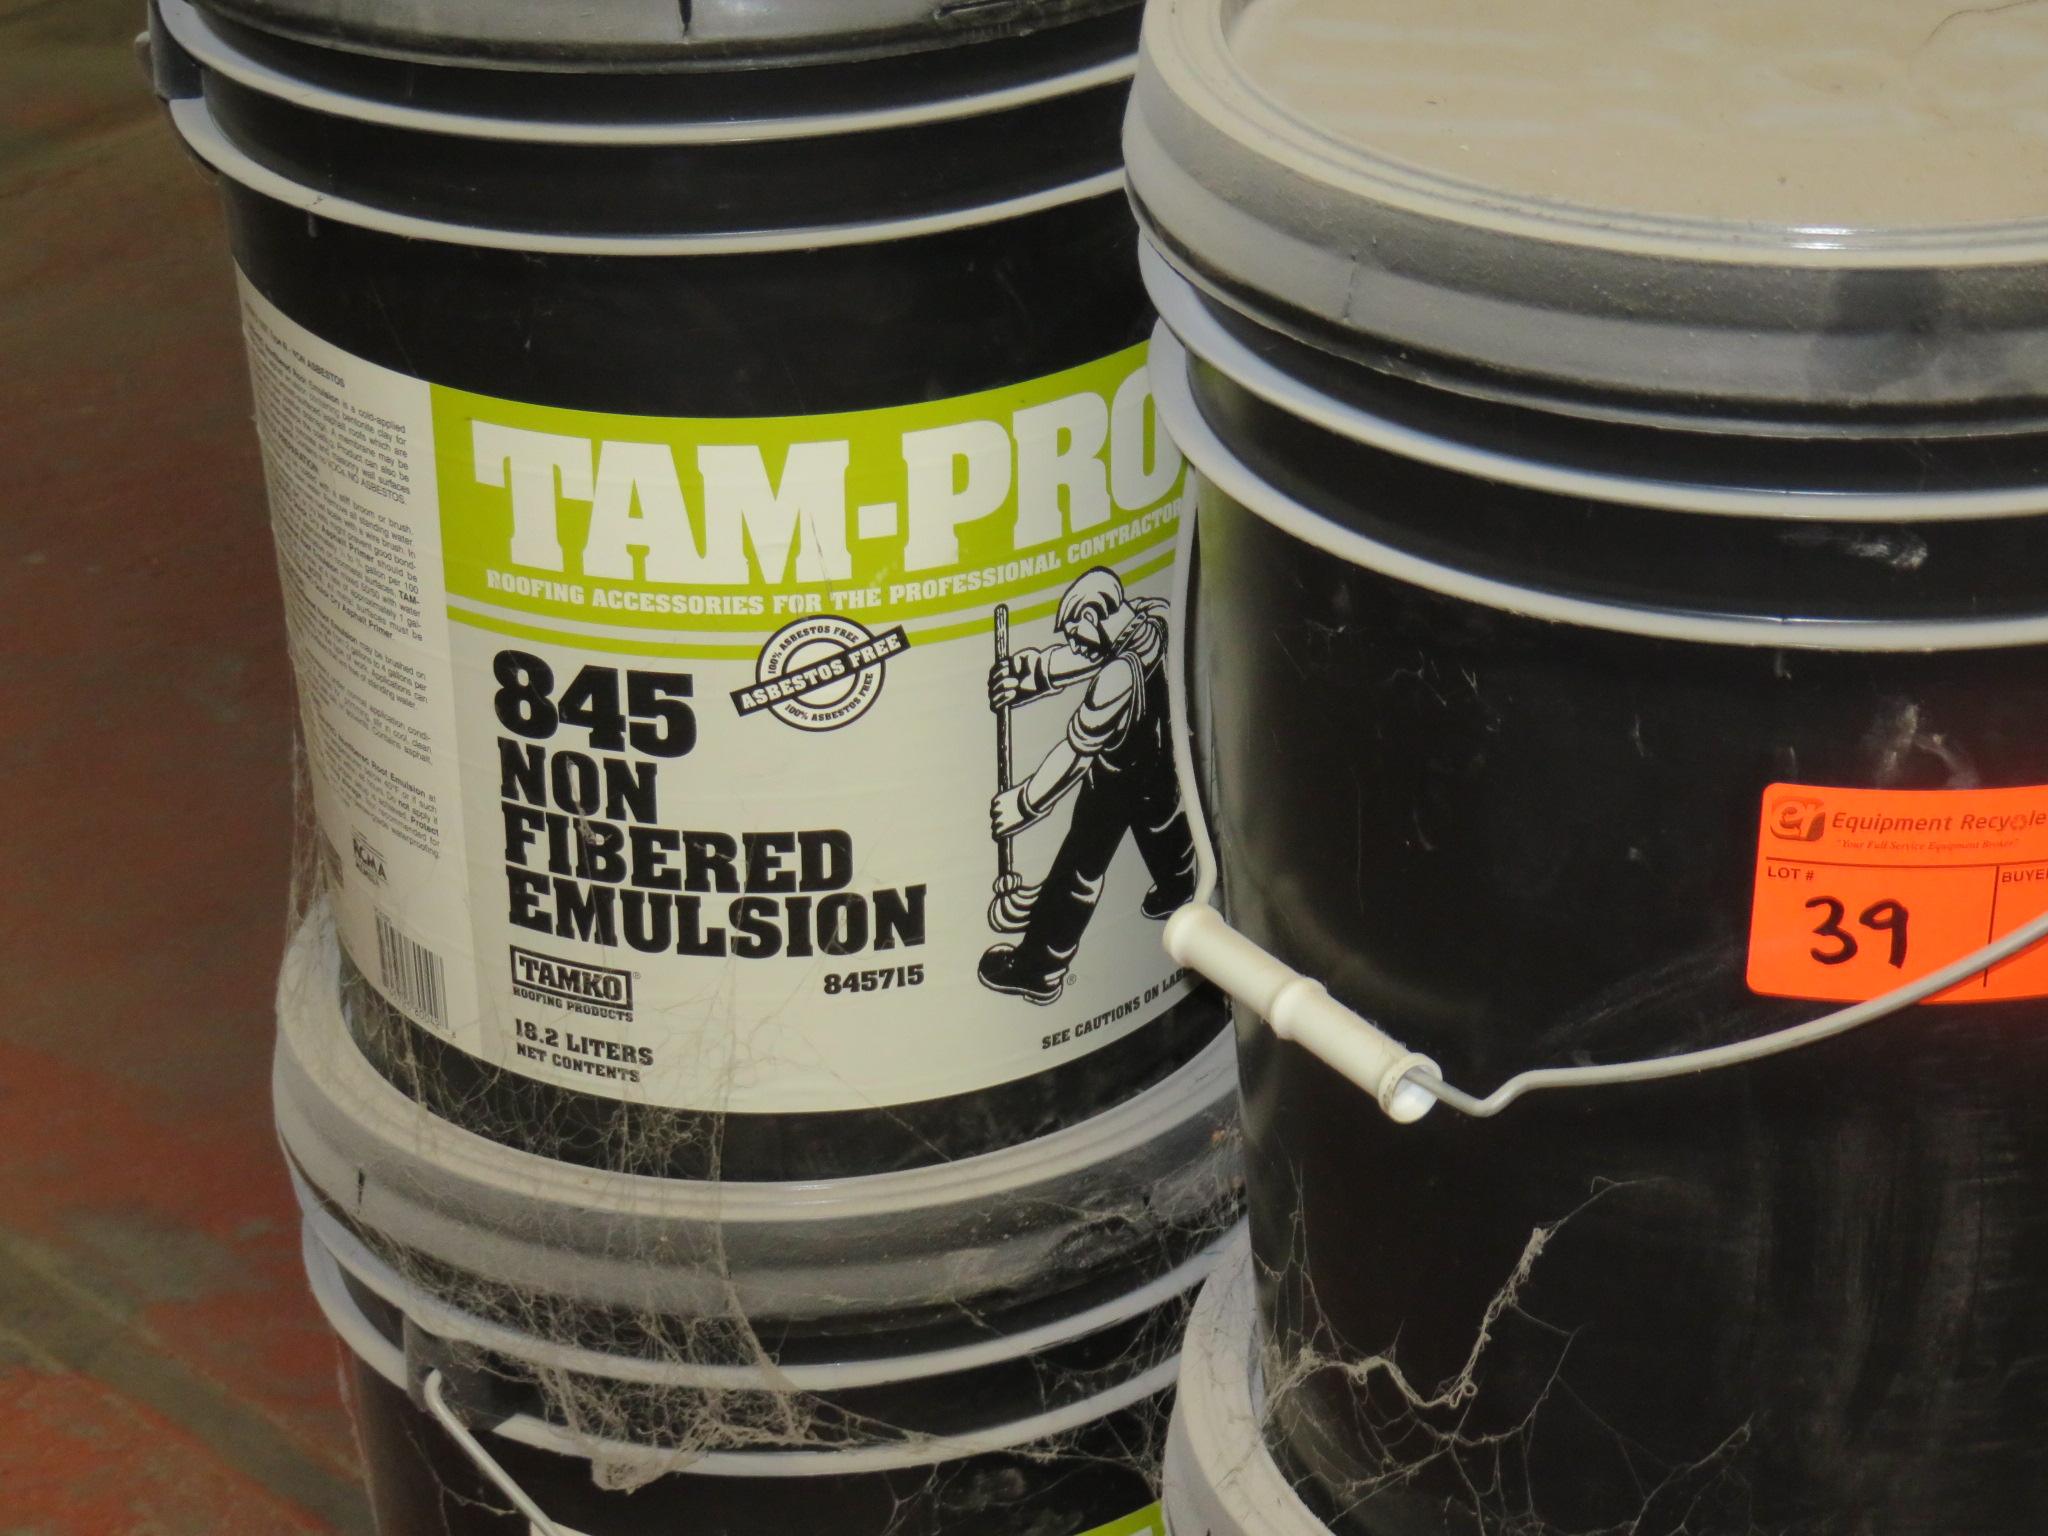 Large Lot Tam-Pro Silastic 845 M-2 Non Fibered Emulsion - Image 5 of 5